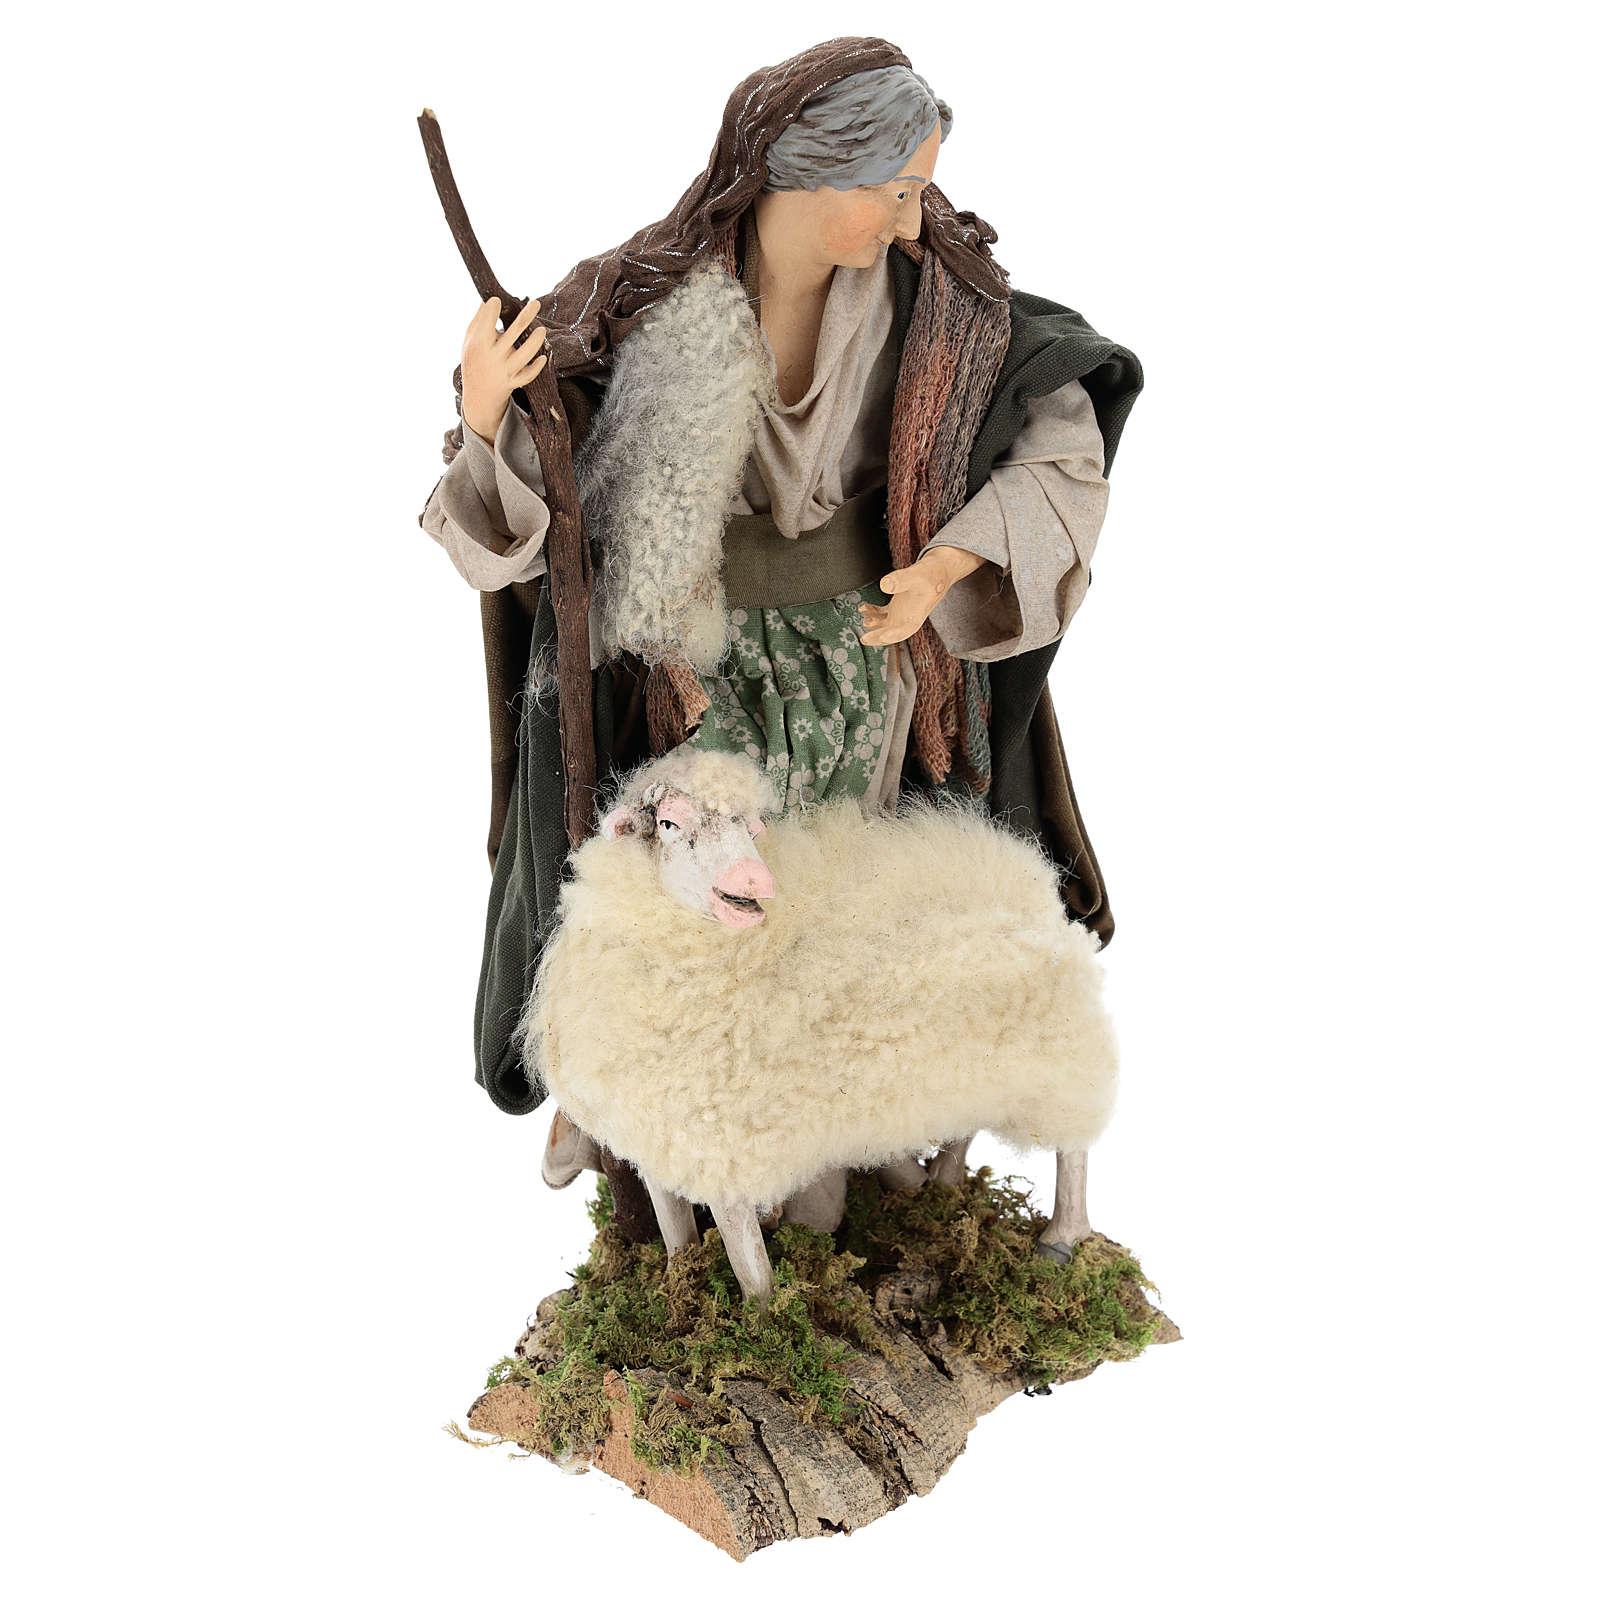 Vieja con oveja para belén Nápoles estilo 700 de 35 cm de altura media 4